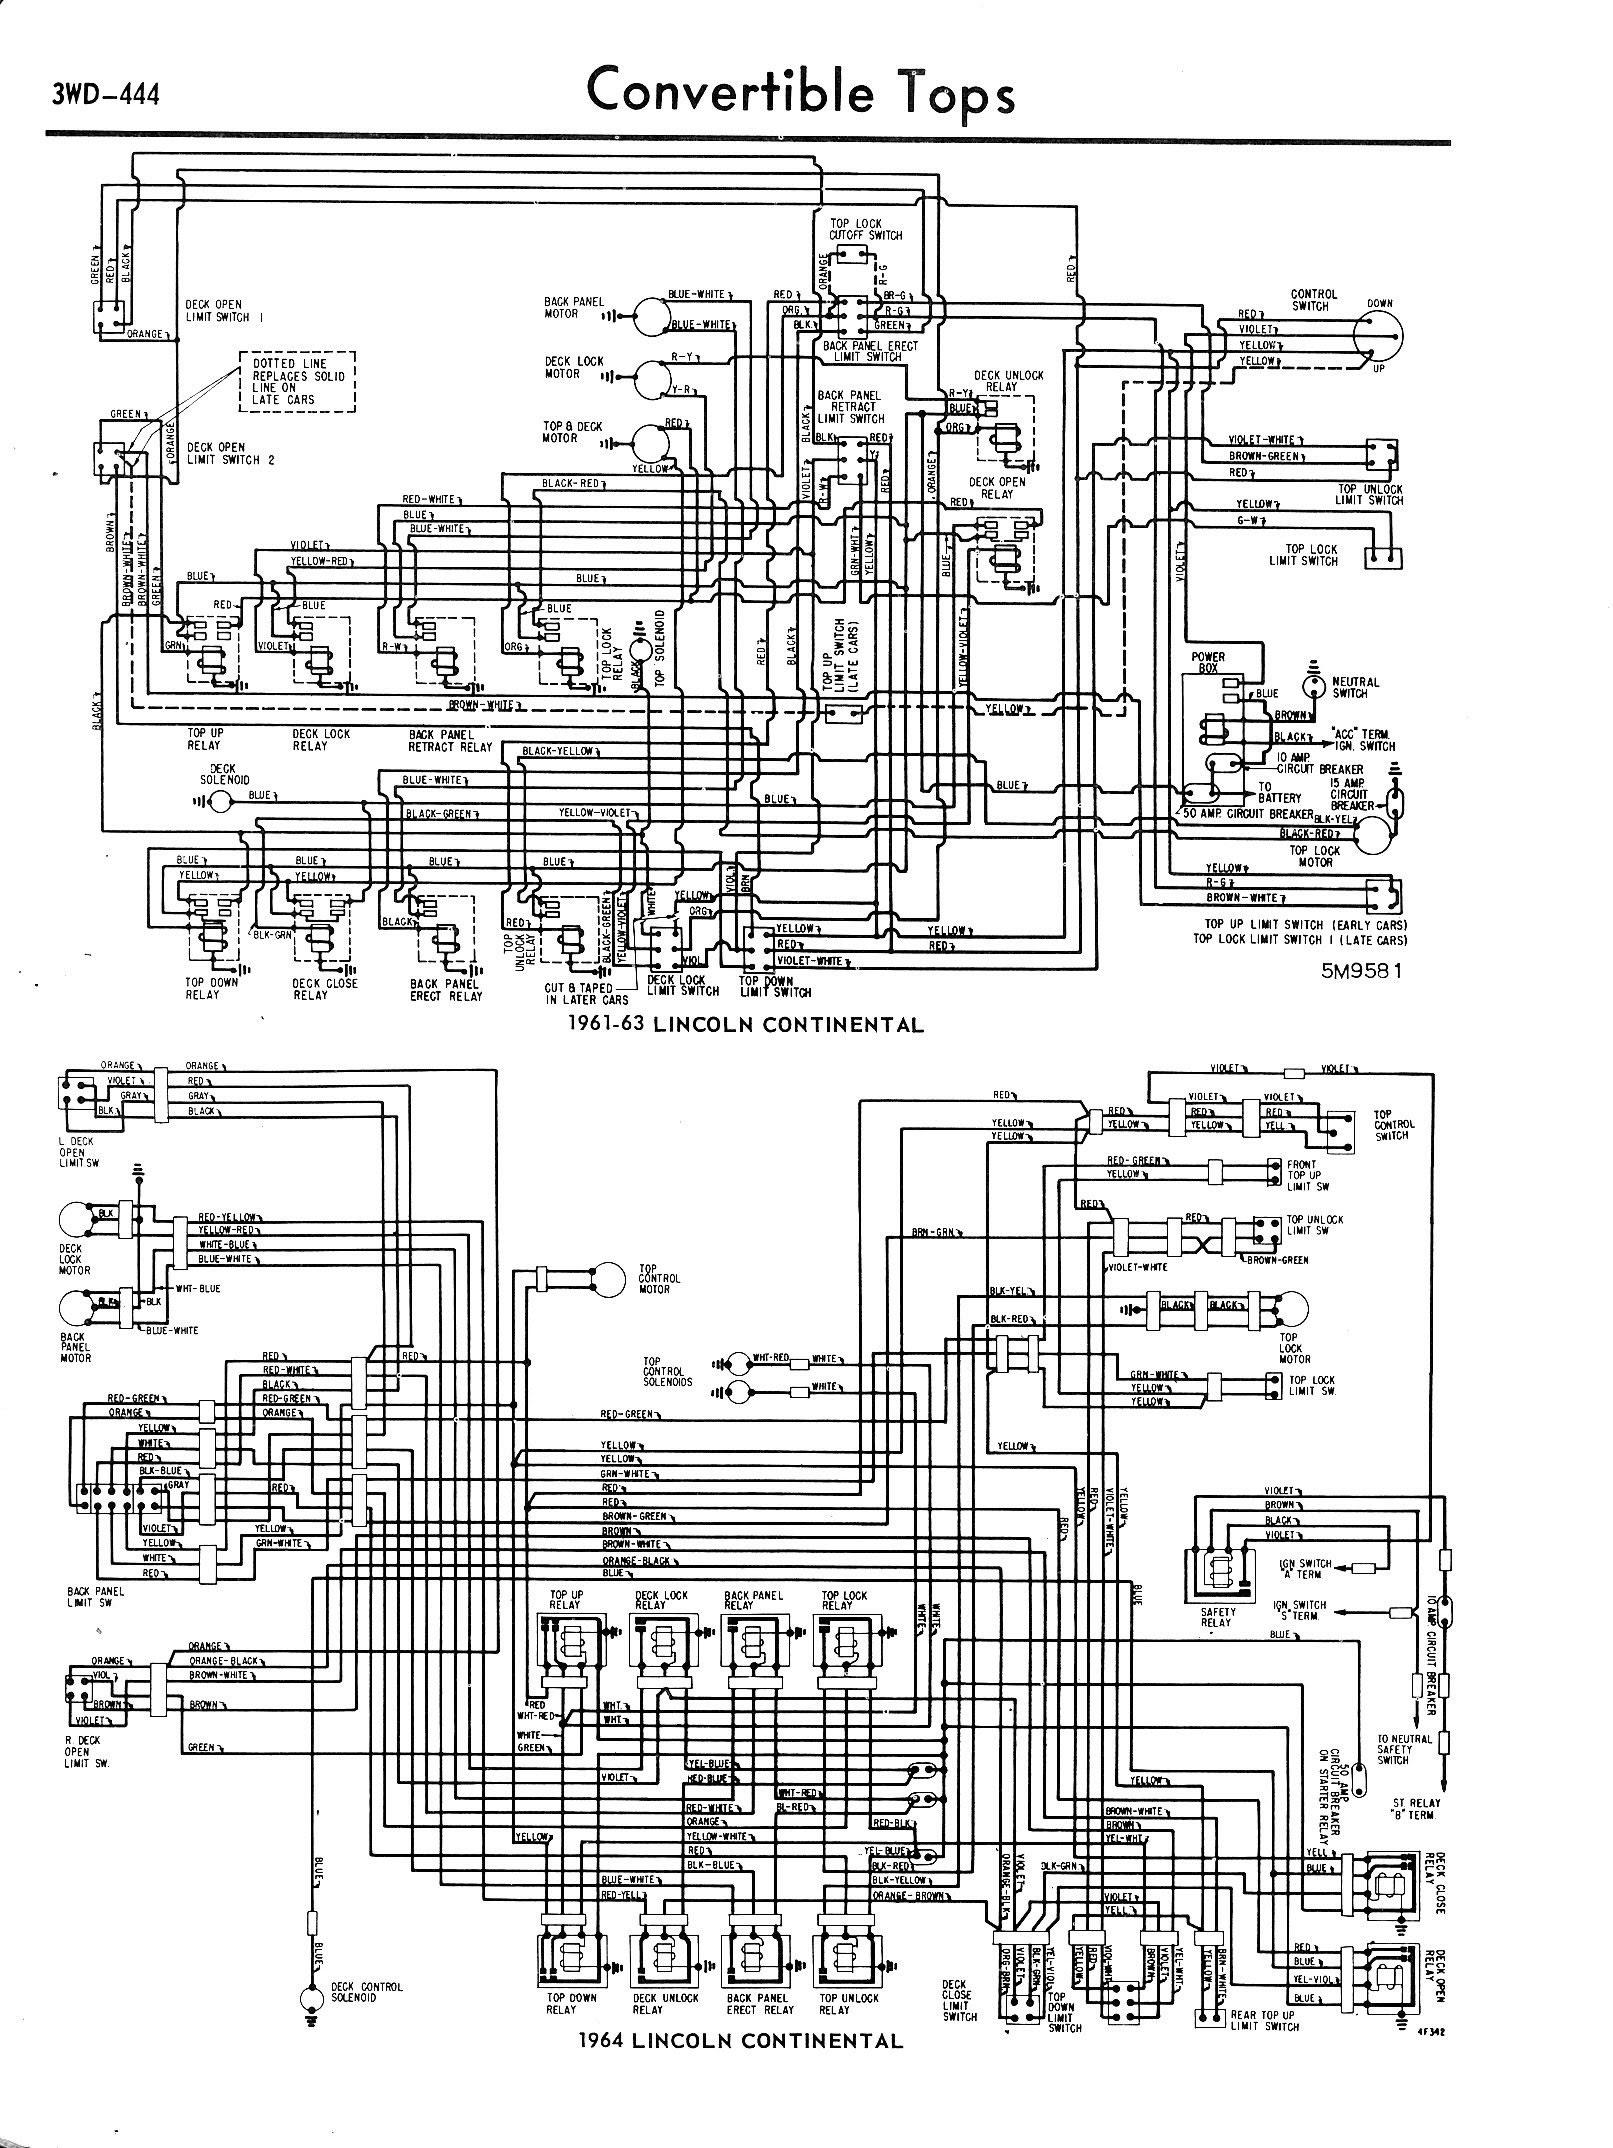 Ford L9000 Wiring Diagram Brakelight - Wiring Diagram | Turn Signal Wiring Diagram 1985 Ford Ltl 9000 |  | Wiring Diagram